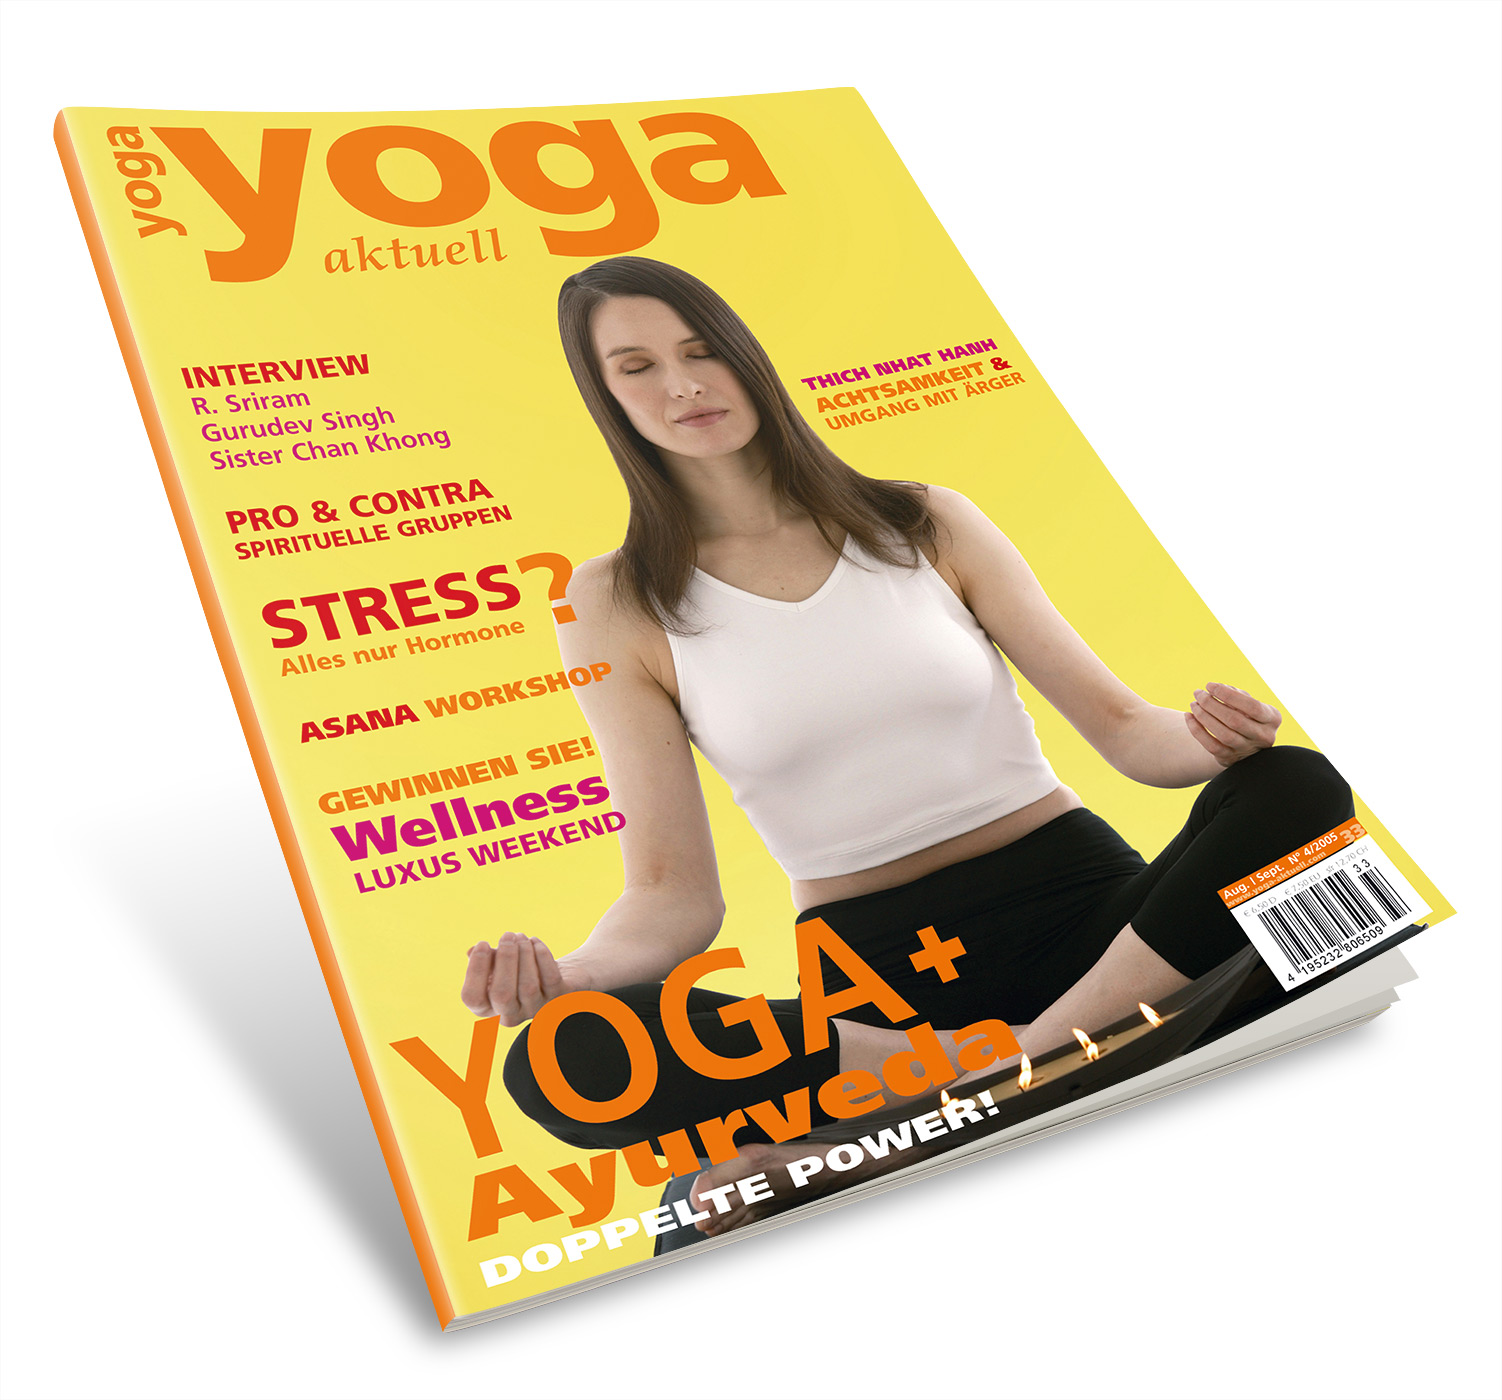 Yoga Aktuell 33 - 04/2005